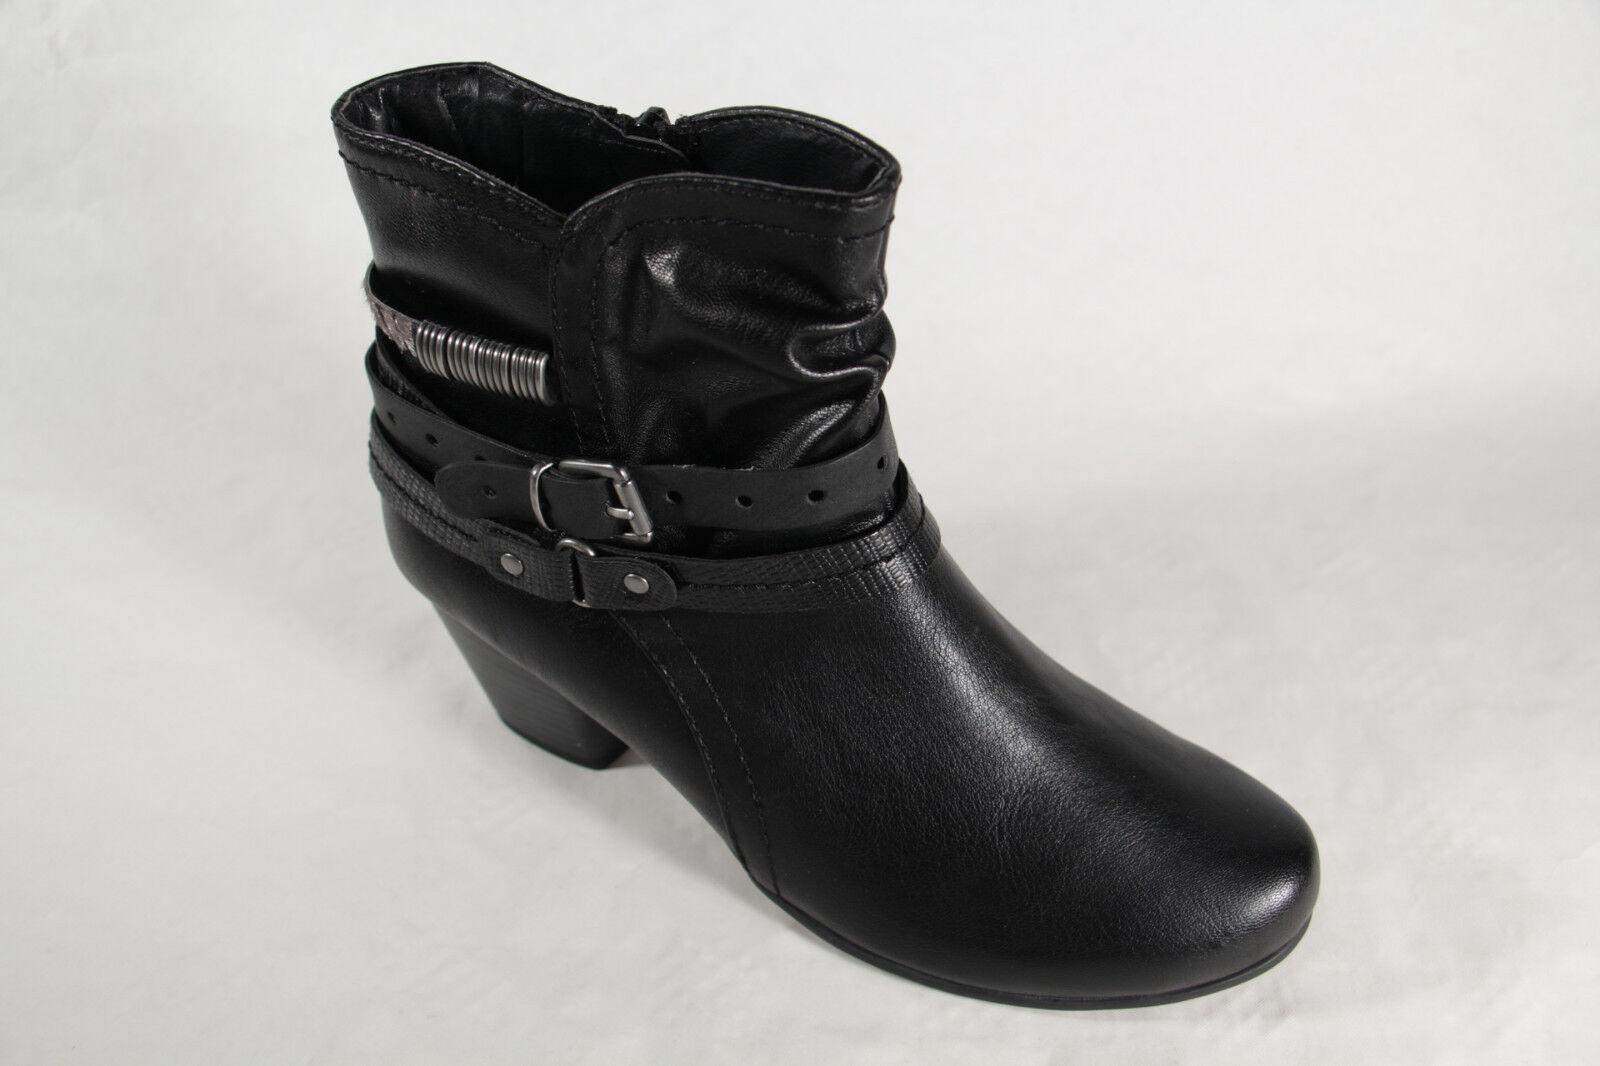 Botas Botín es Boots 843b36 Negro Jana Anabeltarot Nuevo 25360 Tw7Pqnav